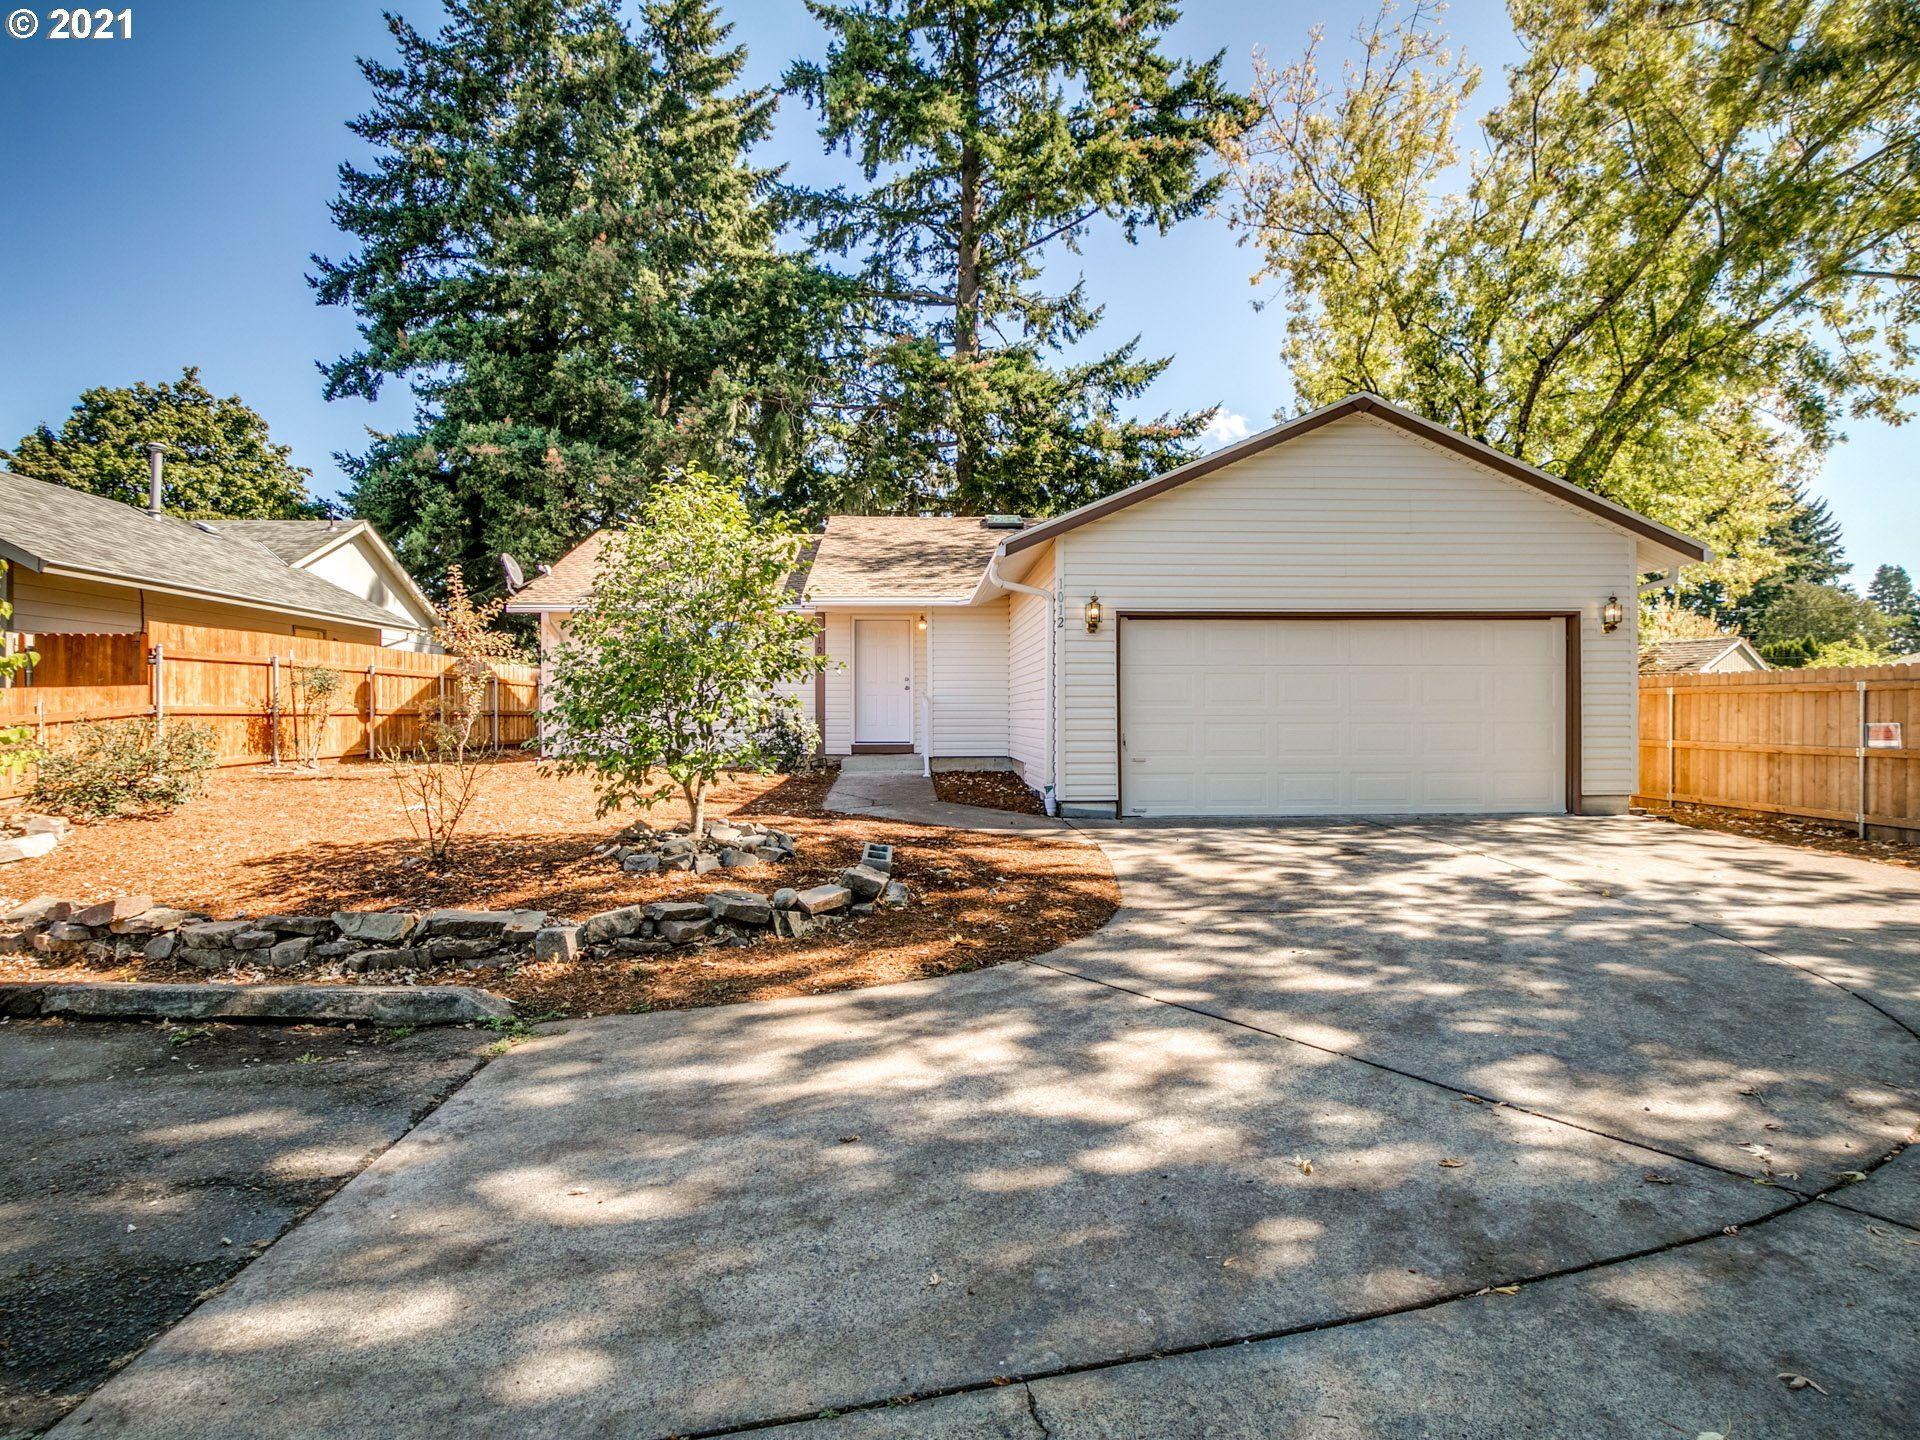 1012 SE 123RD AVE, Portland, OR 97233 - MLS#: 21549065